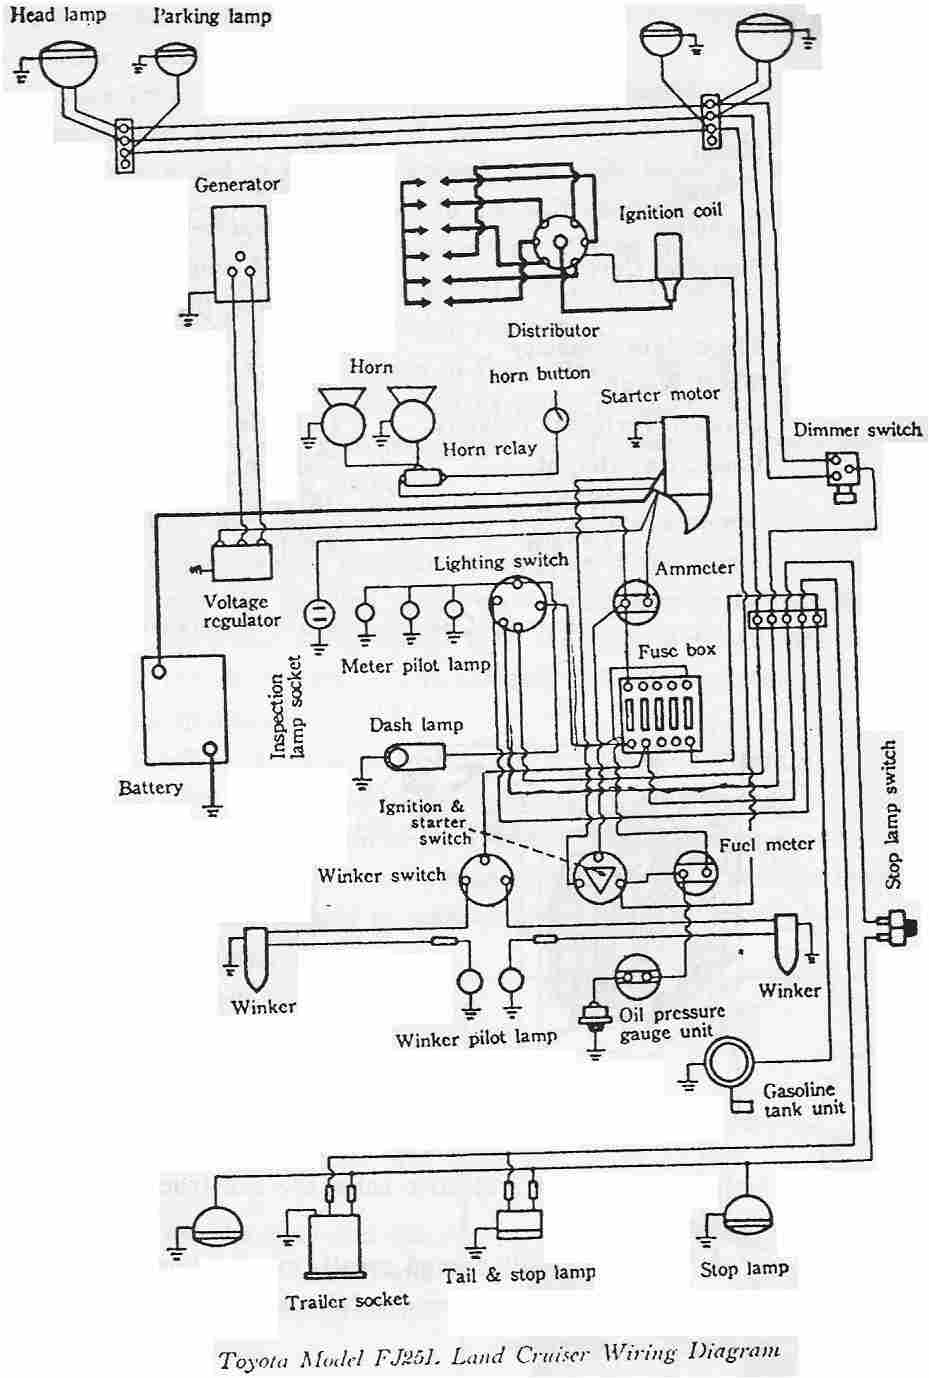 1998 Toyota 4runner Radio Wiring Diagram Bulldog Remote Start Land Cruiser Fj25 Electrical | All About Diagrams